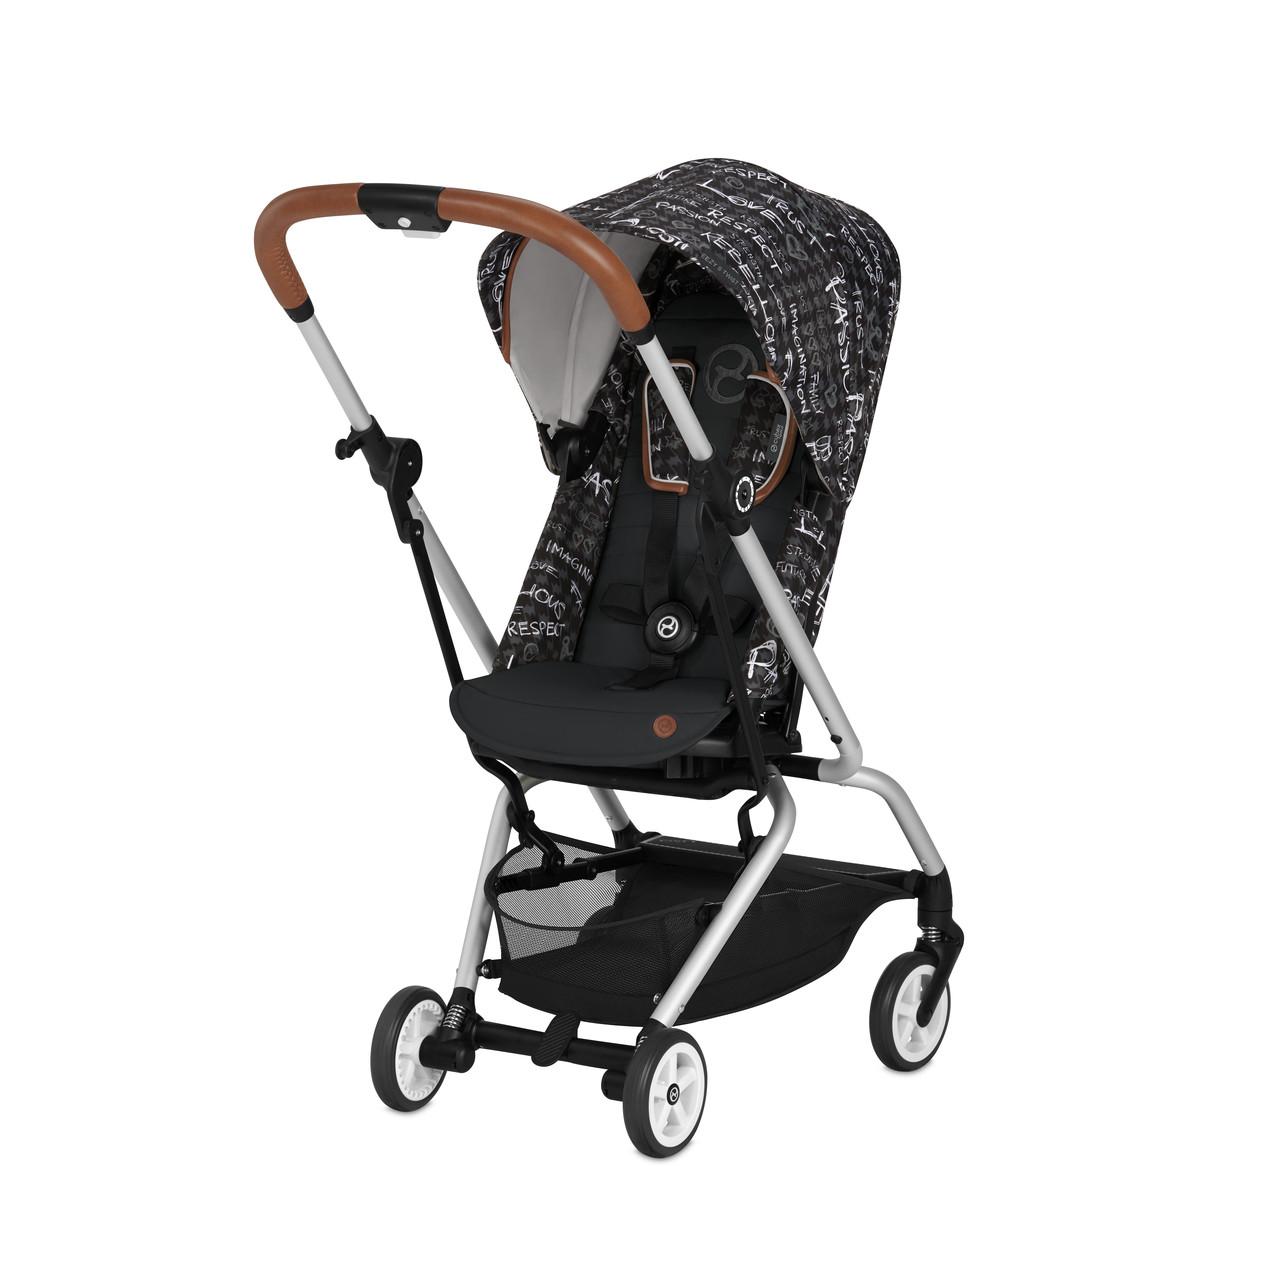 Cybex - Прогулочная коляска Eezy S Twist Values for life, цвет Strength dark-grey